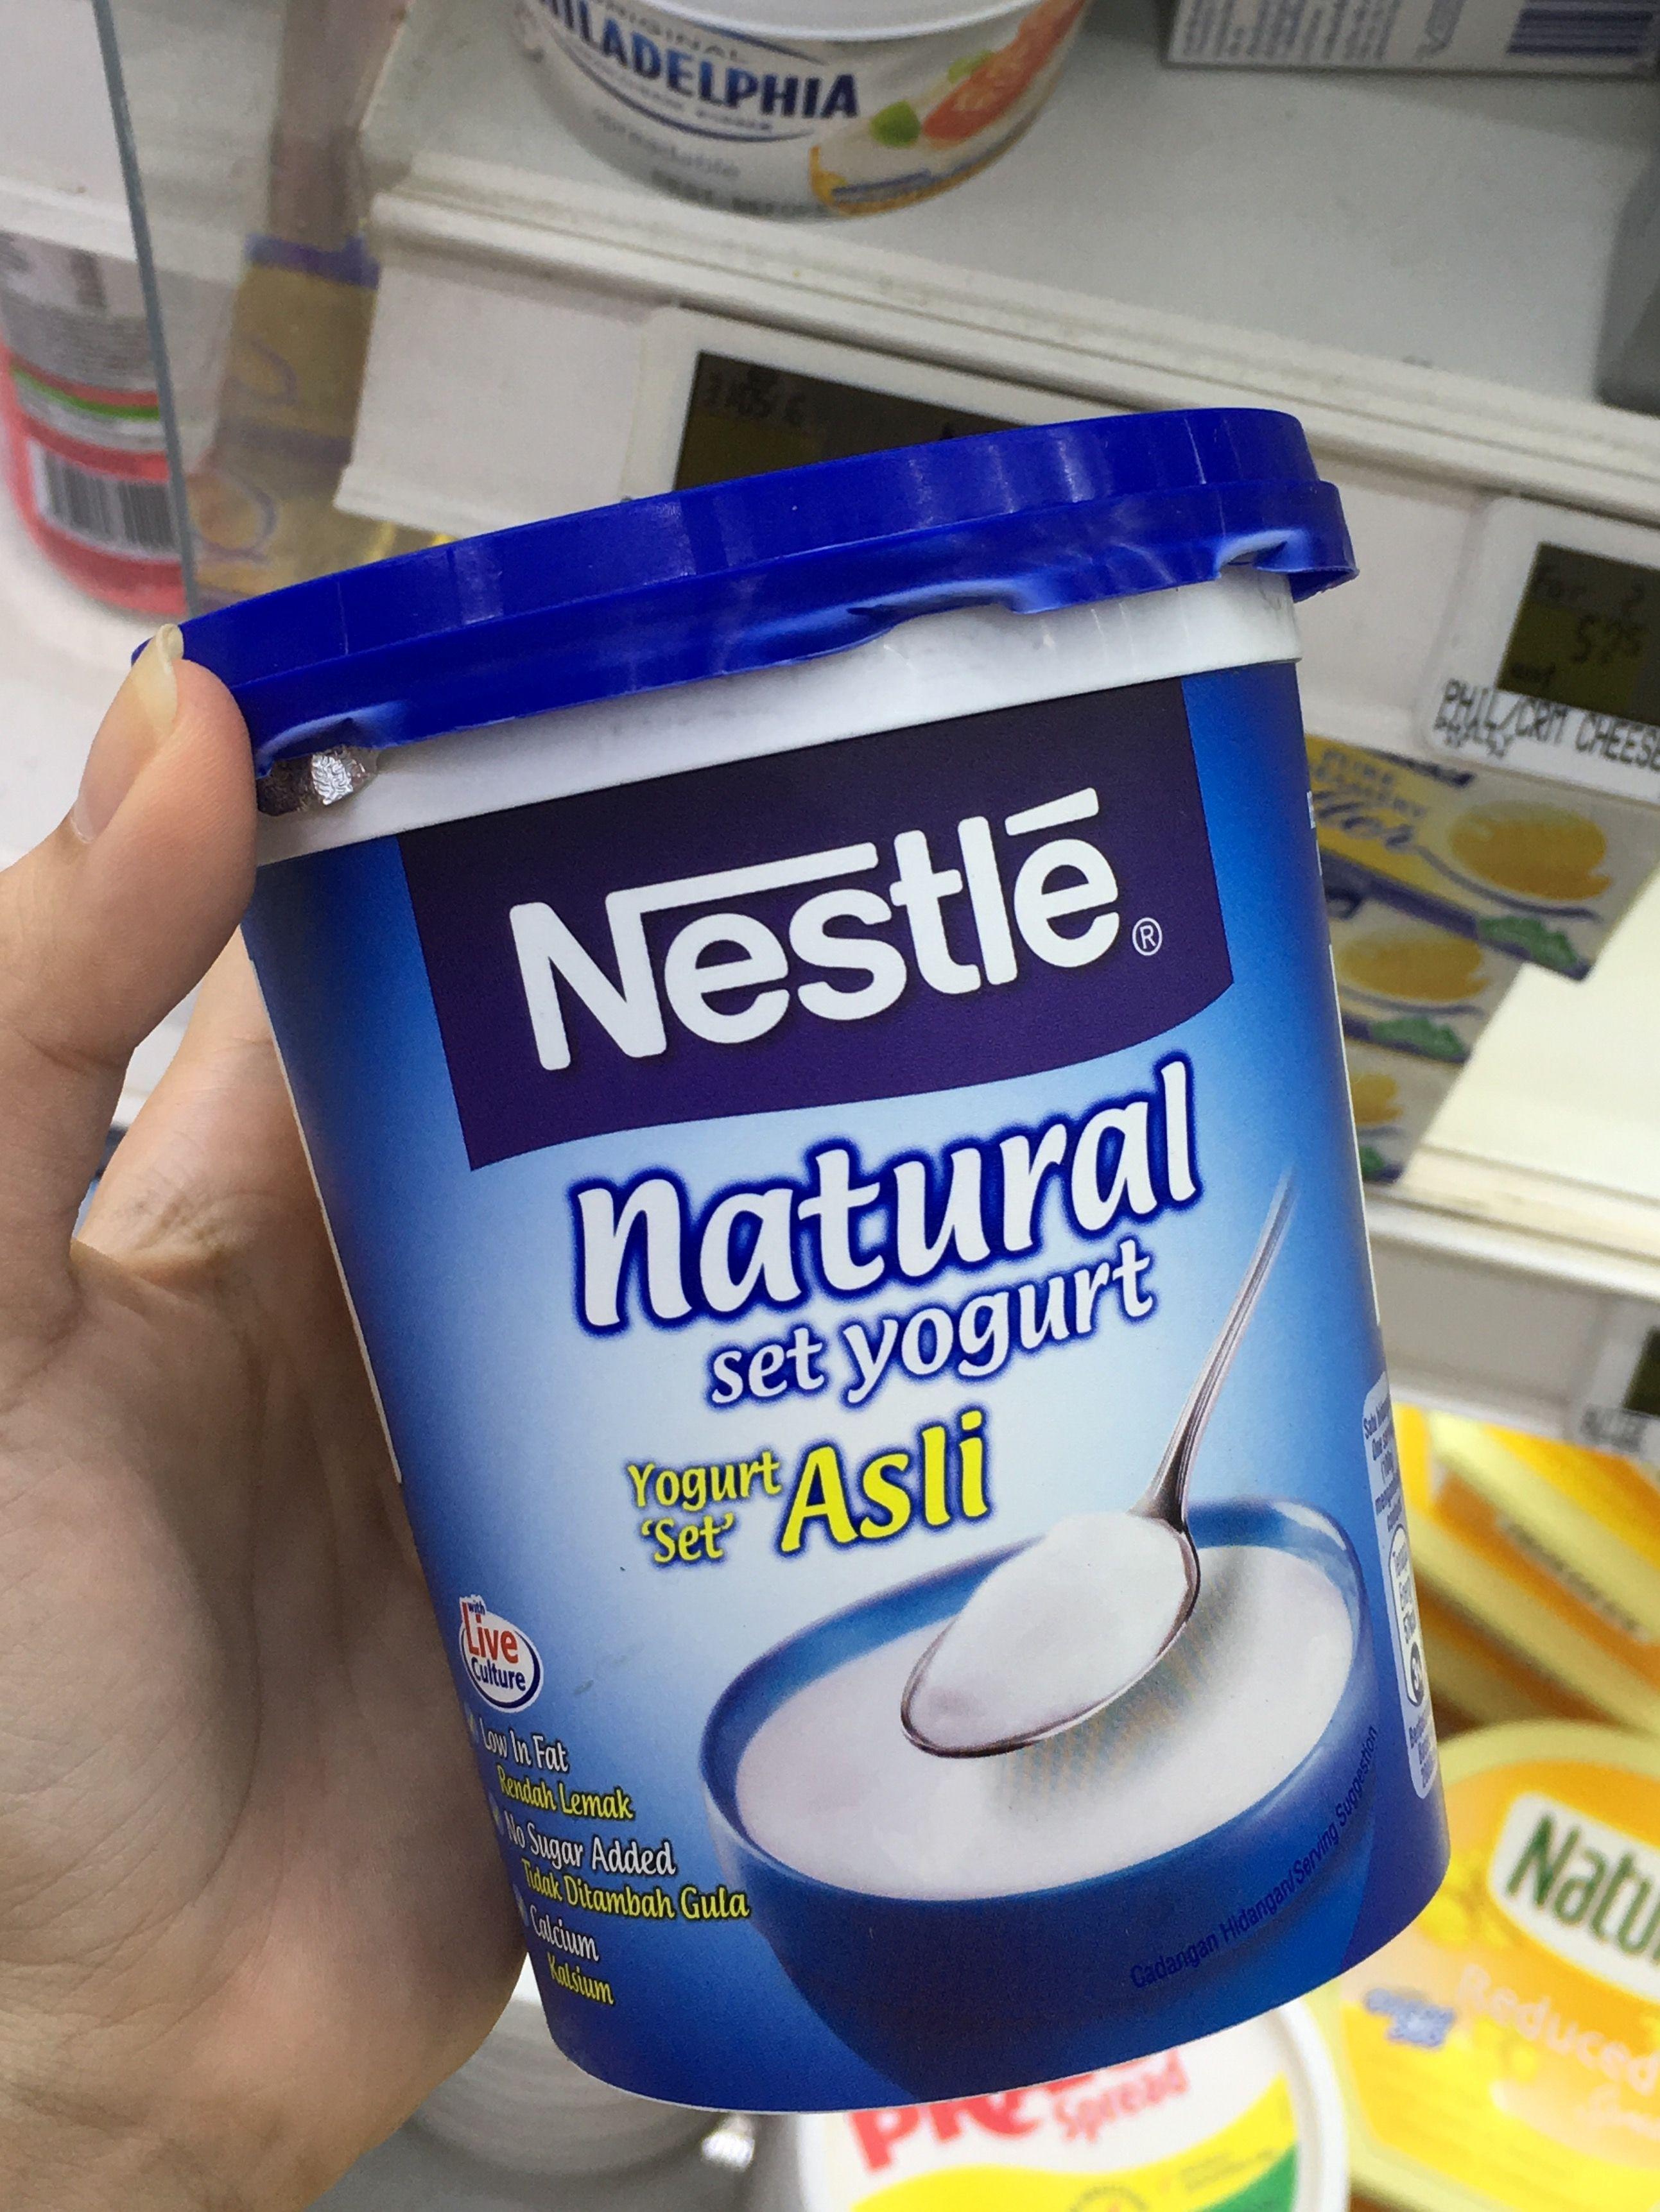 Name Natural Set Yogurt Brand Nestle Weight 470g Packaging Pp